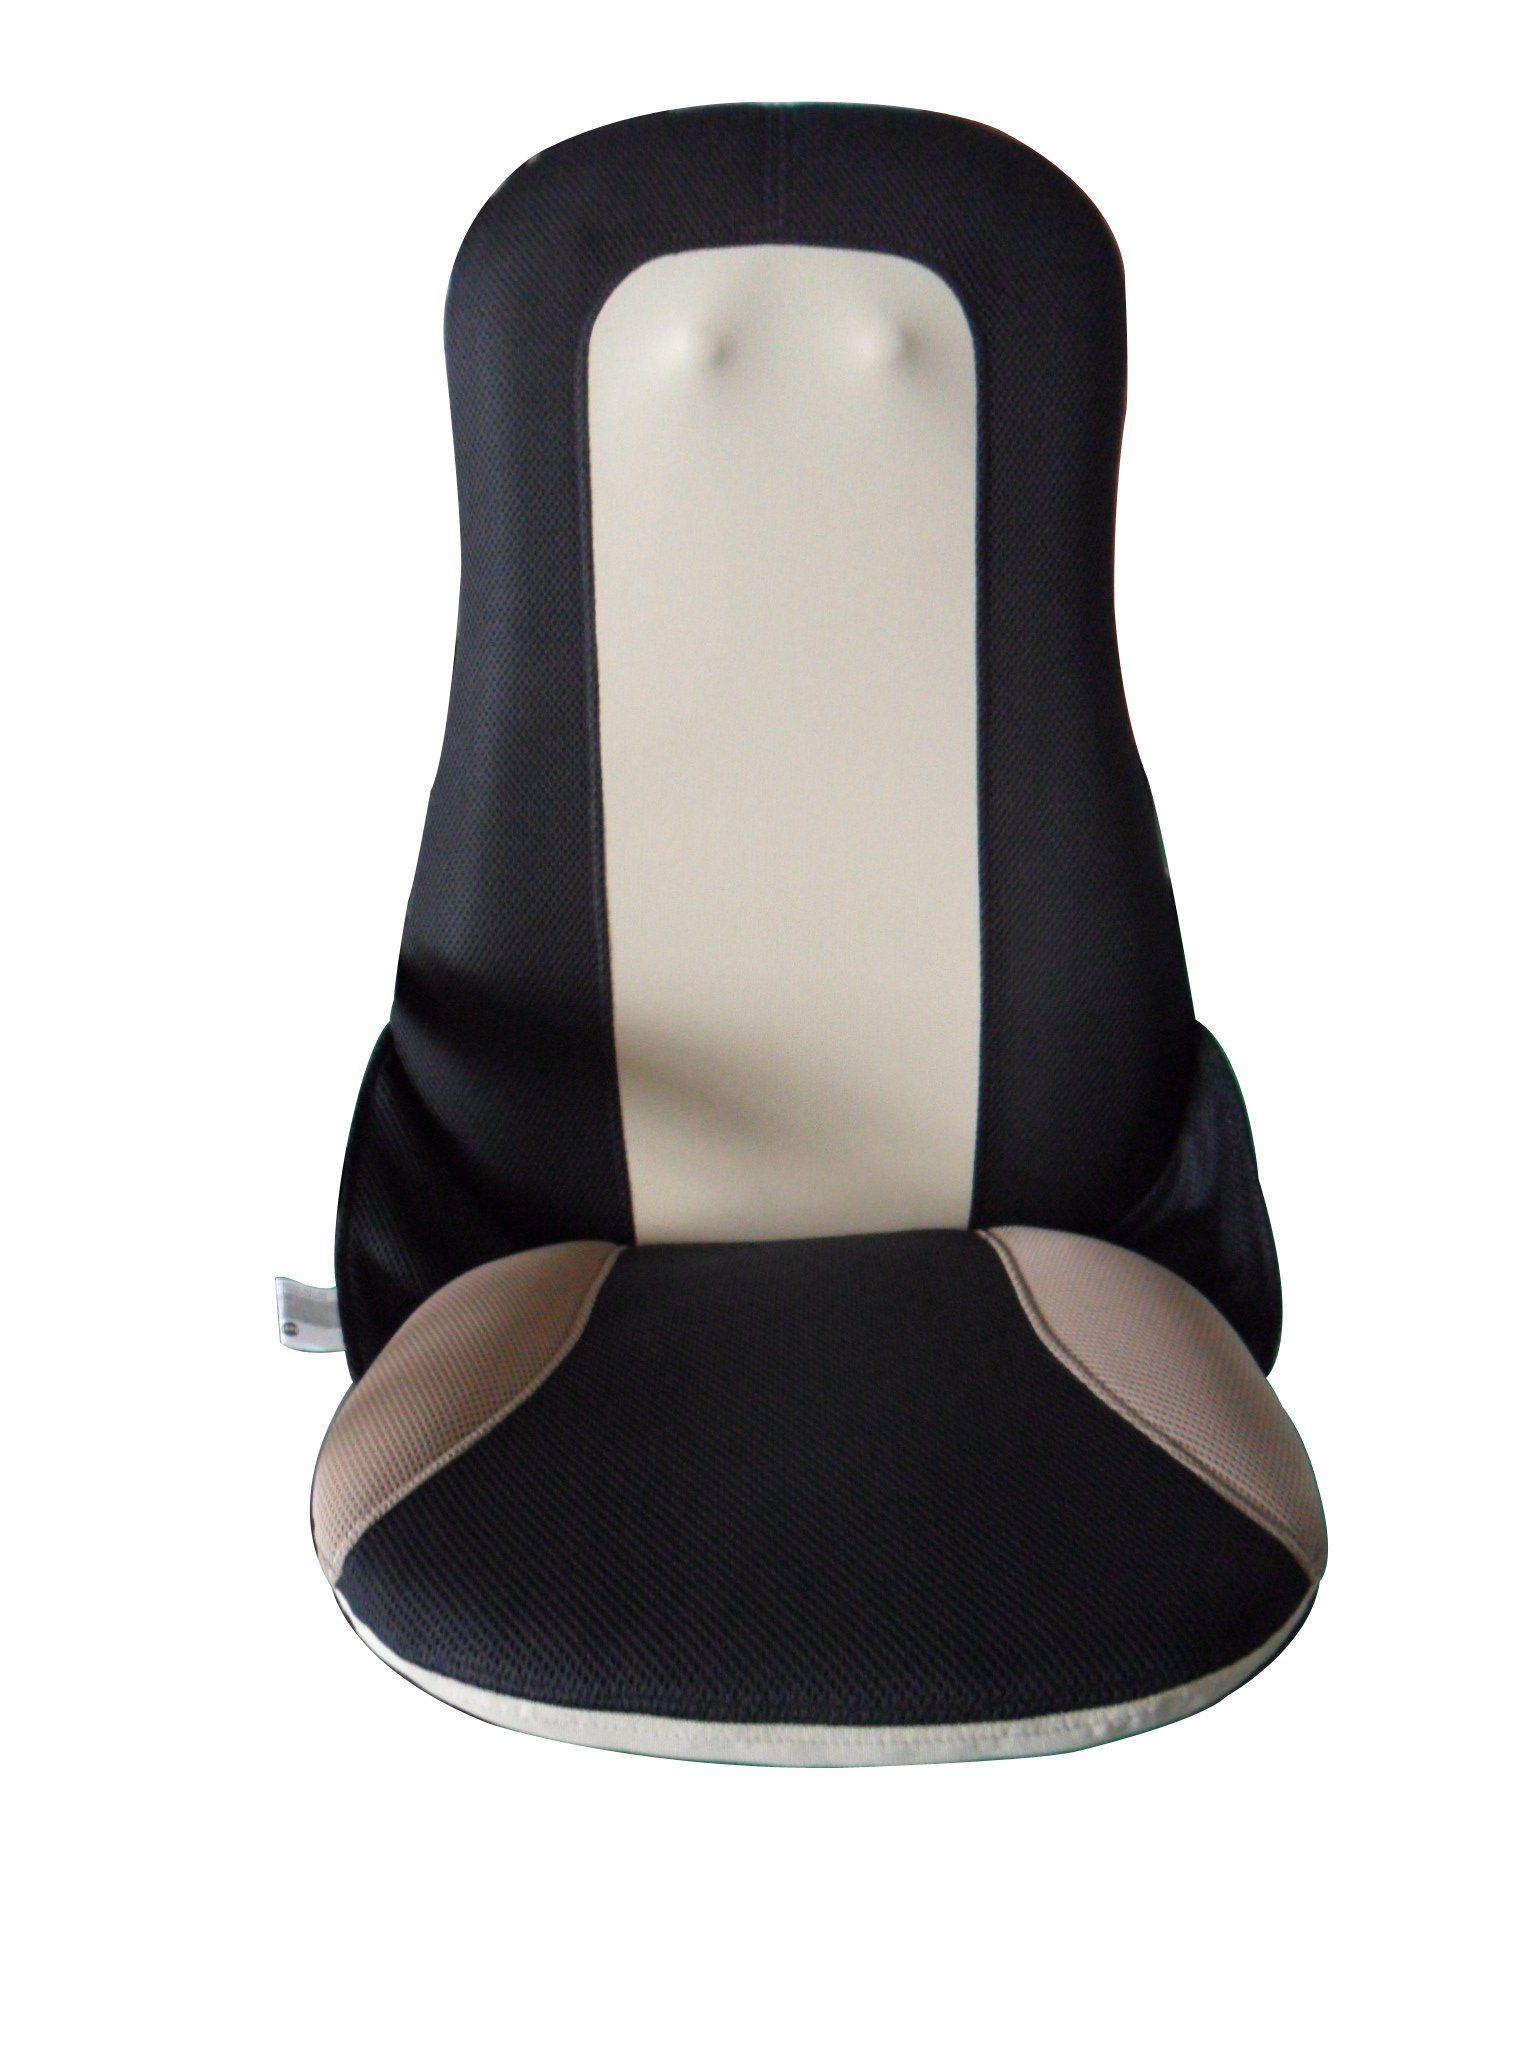 New Shiatsu 3D QuadRoller Massage Cushion with Heat